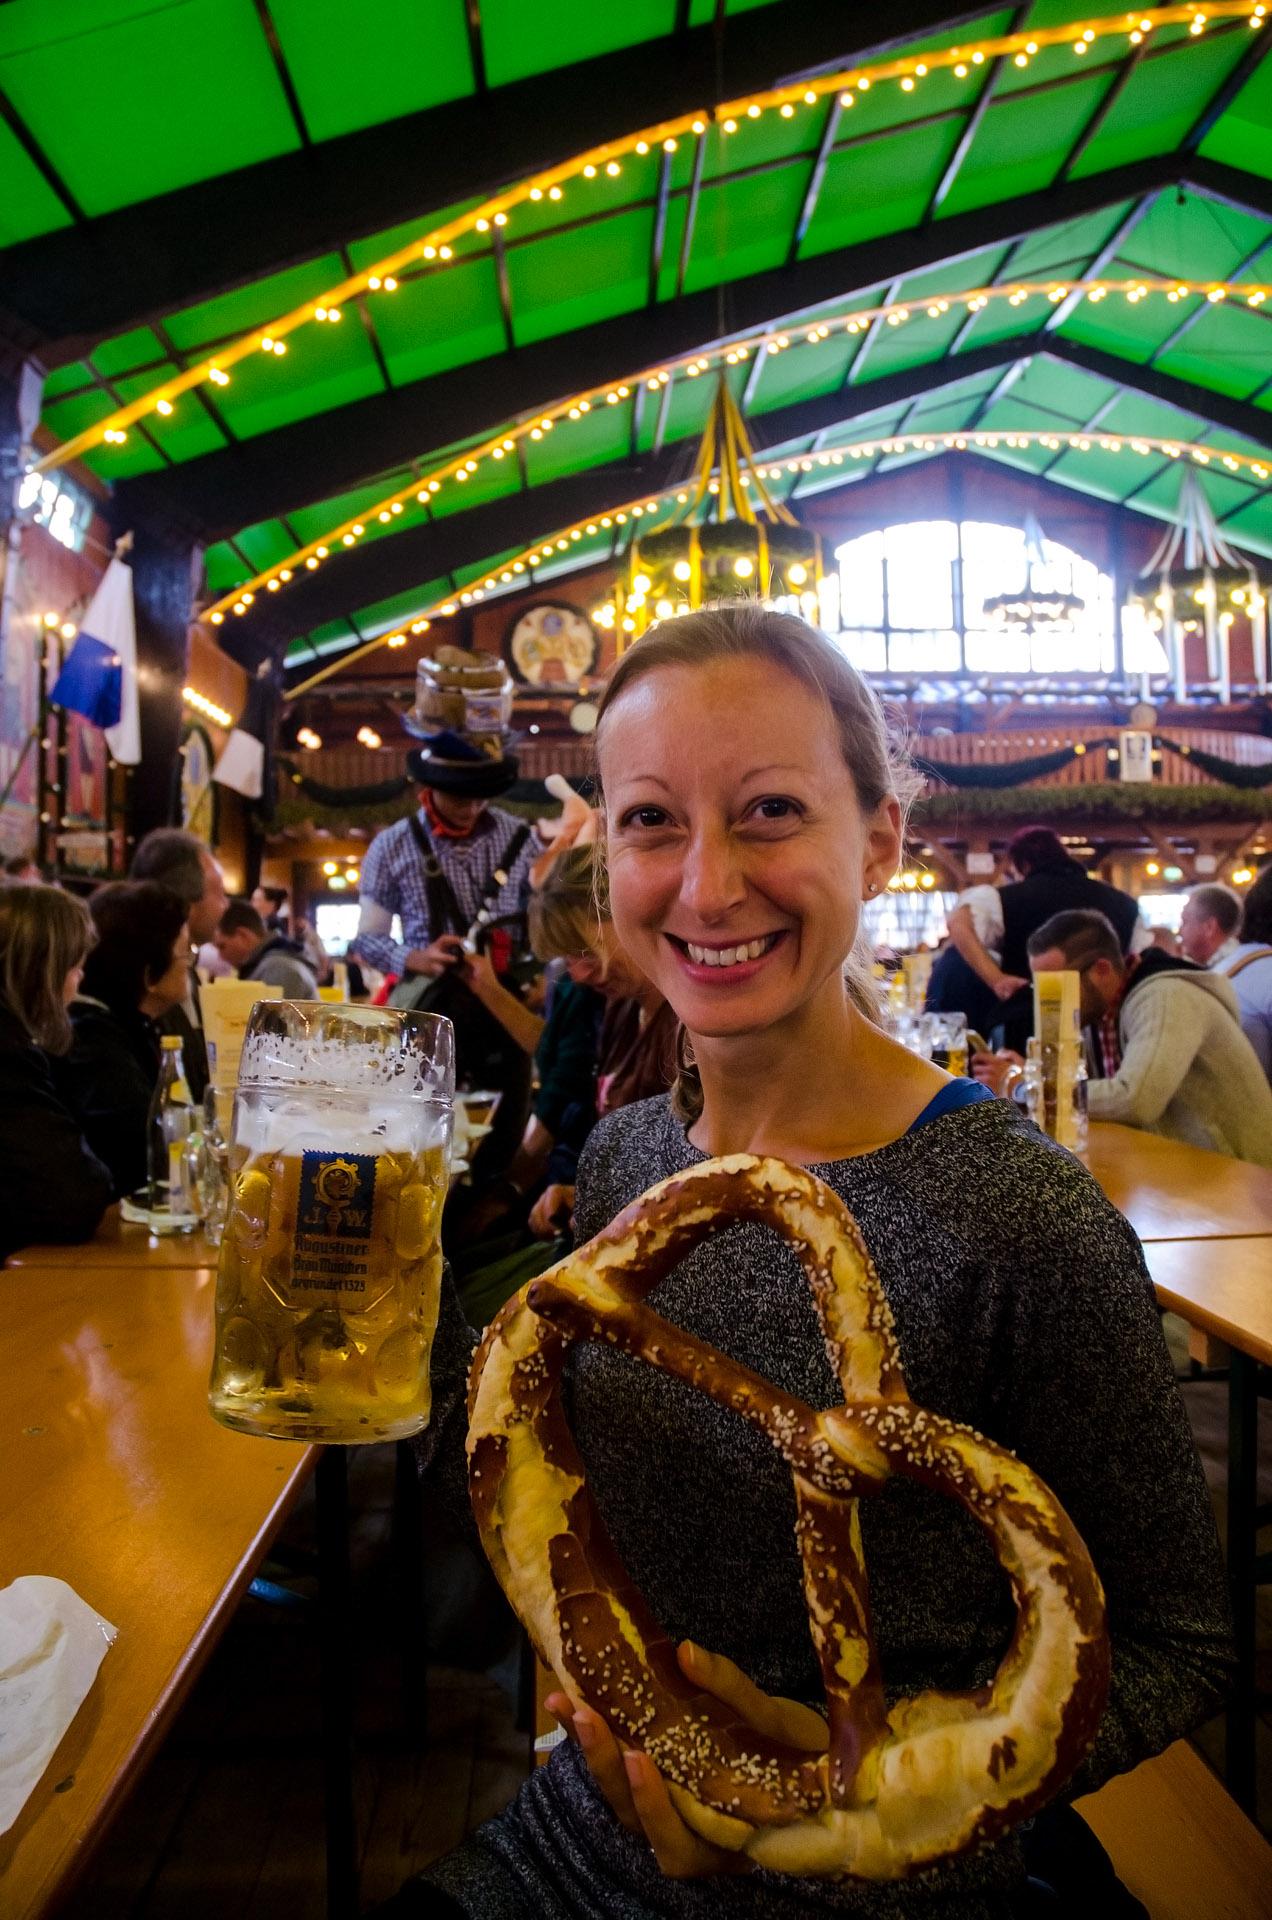 Fest beer & a giant pretzel